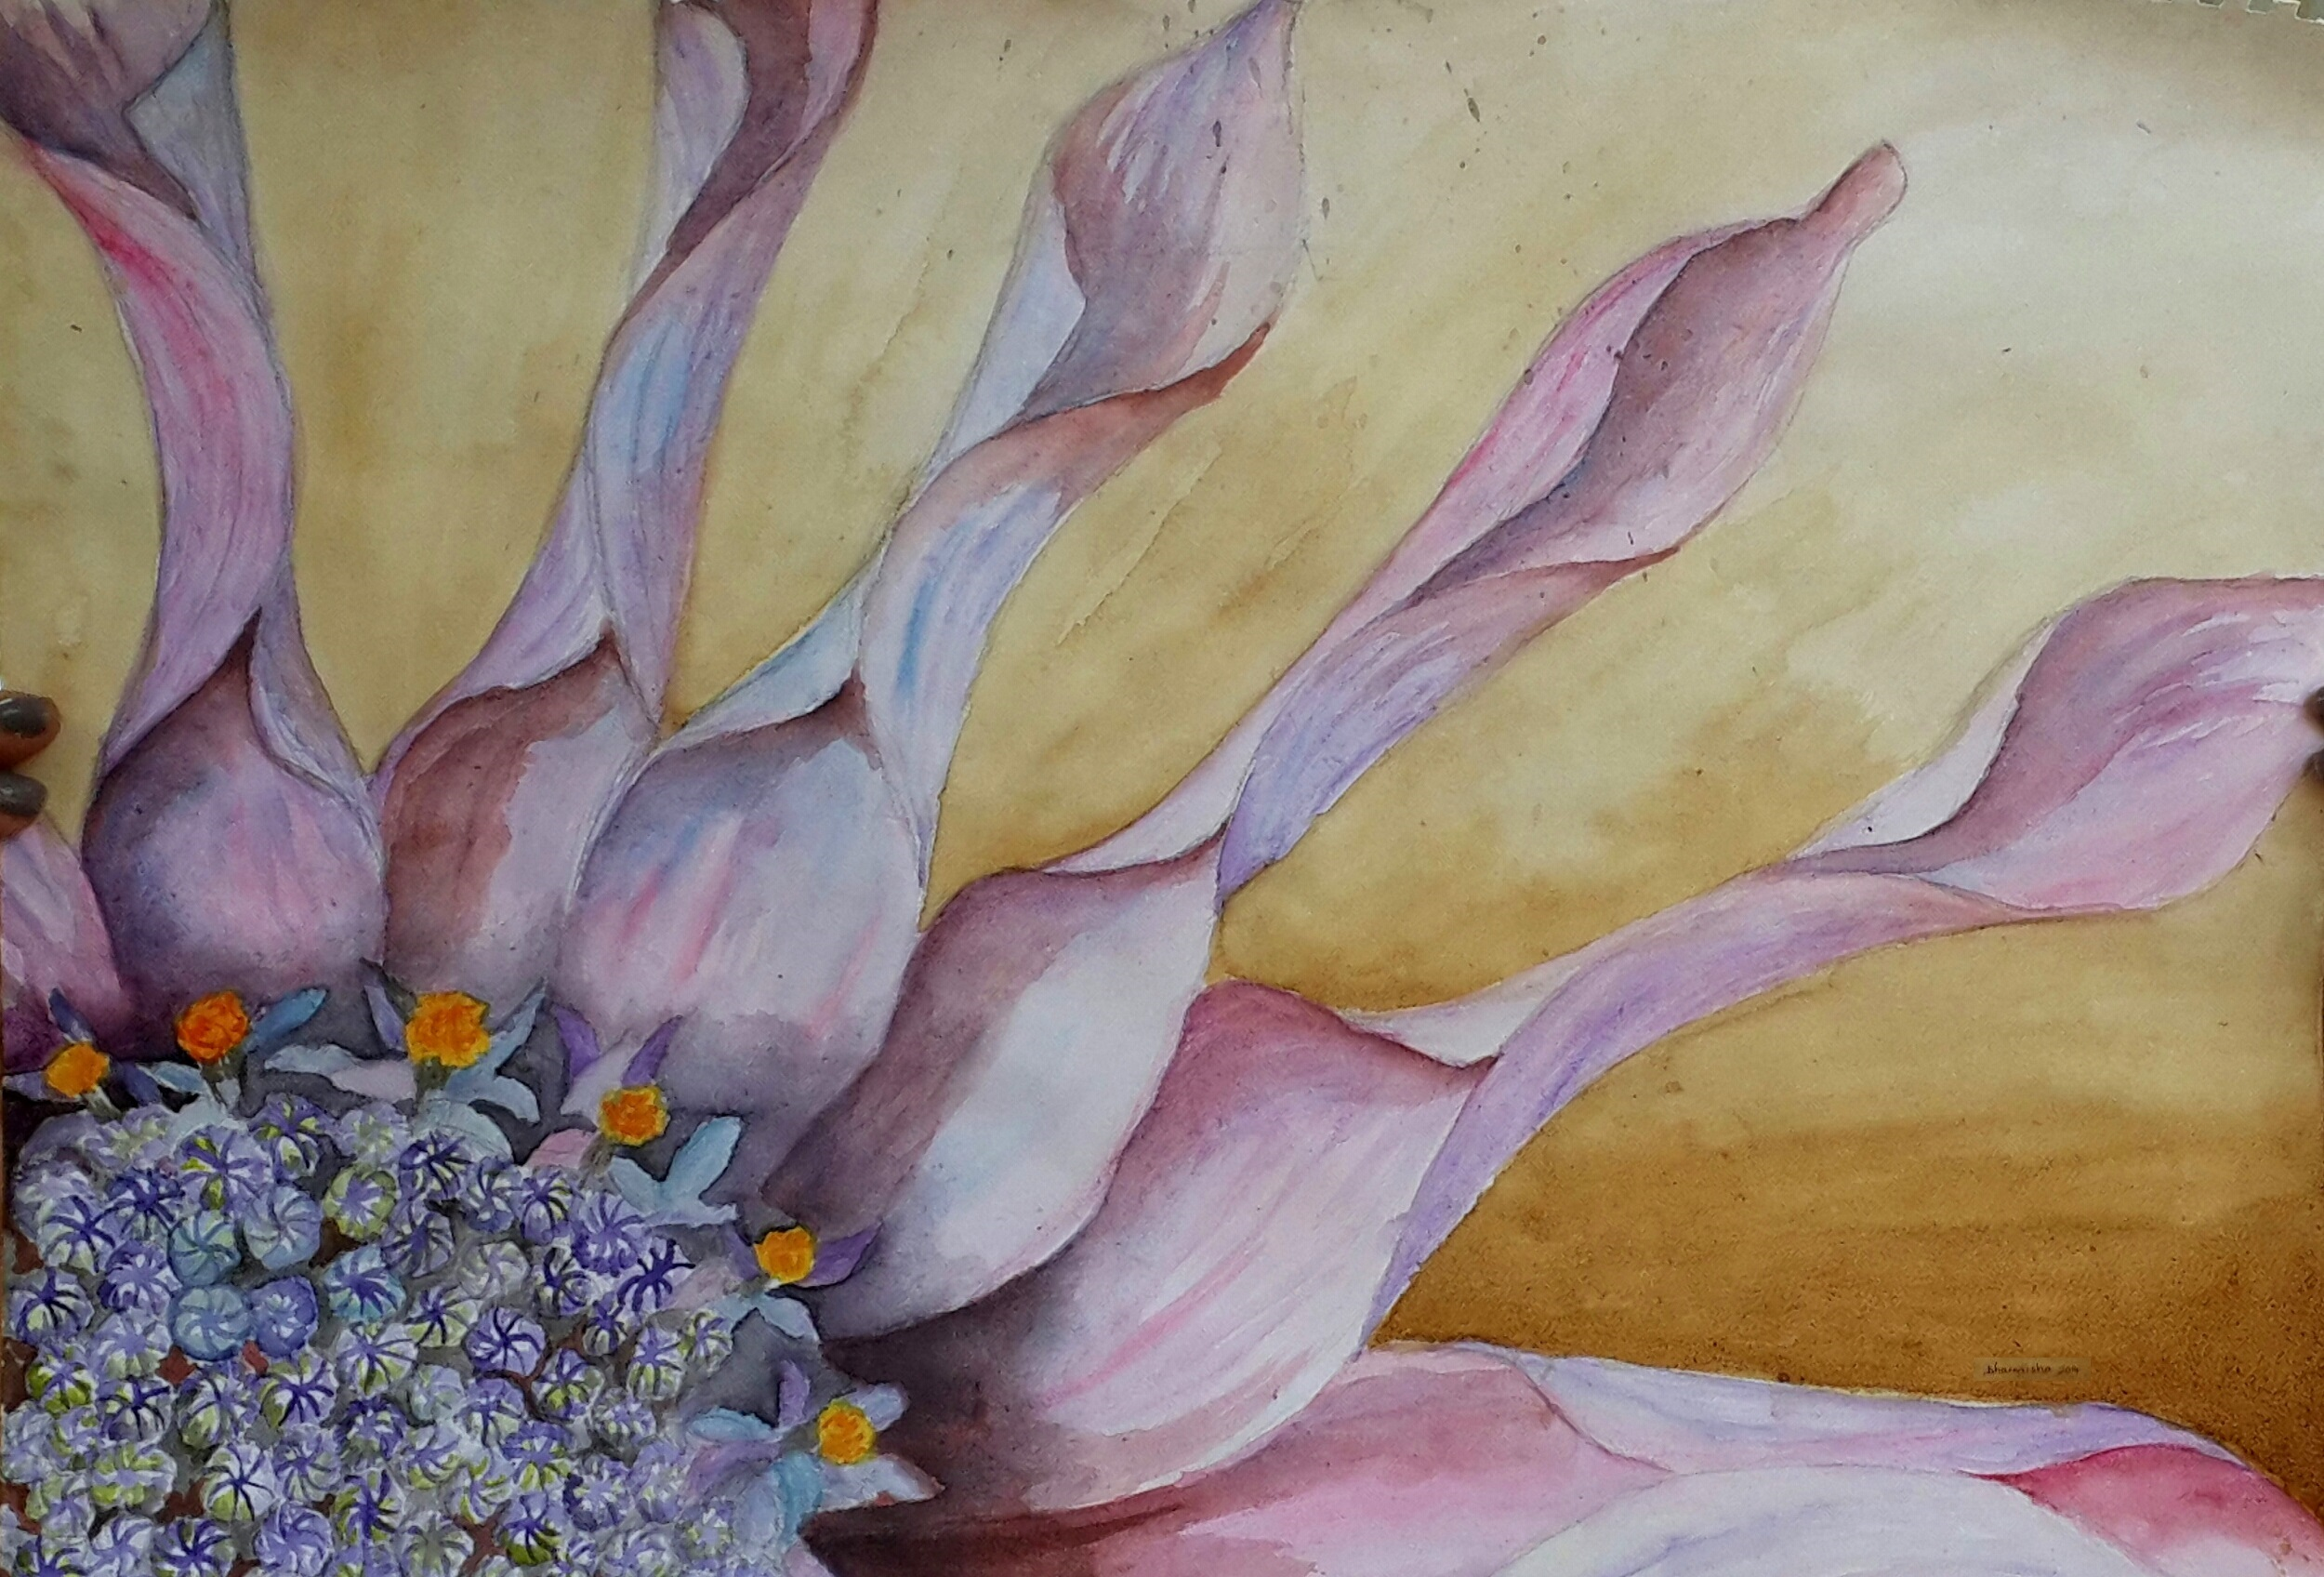 Triptage 2 - Flower